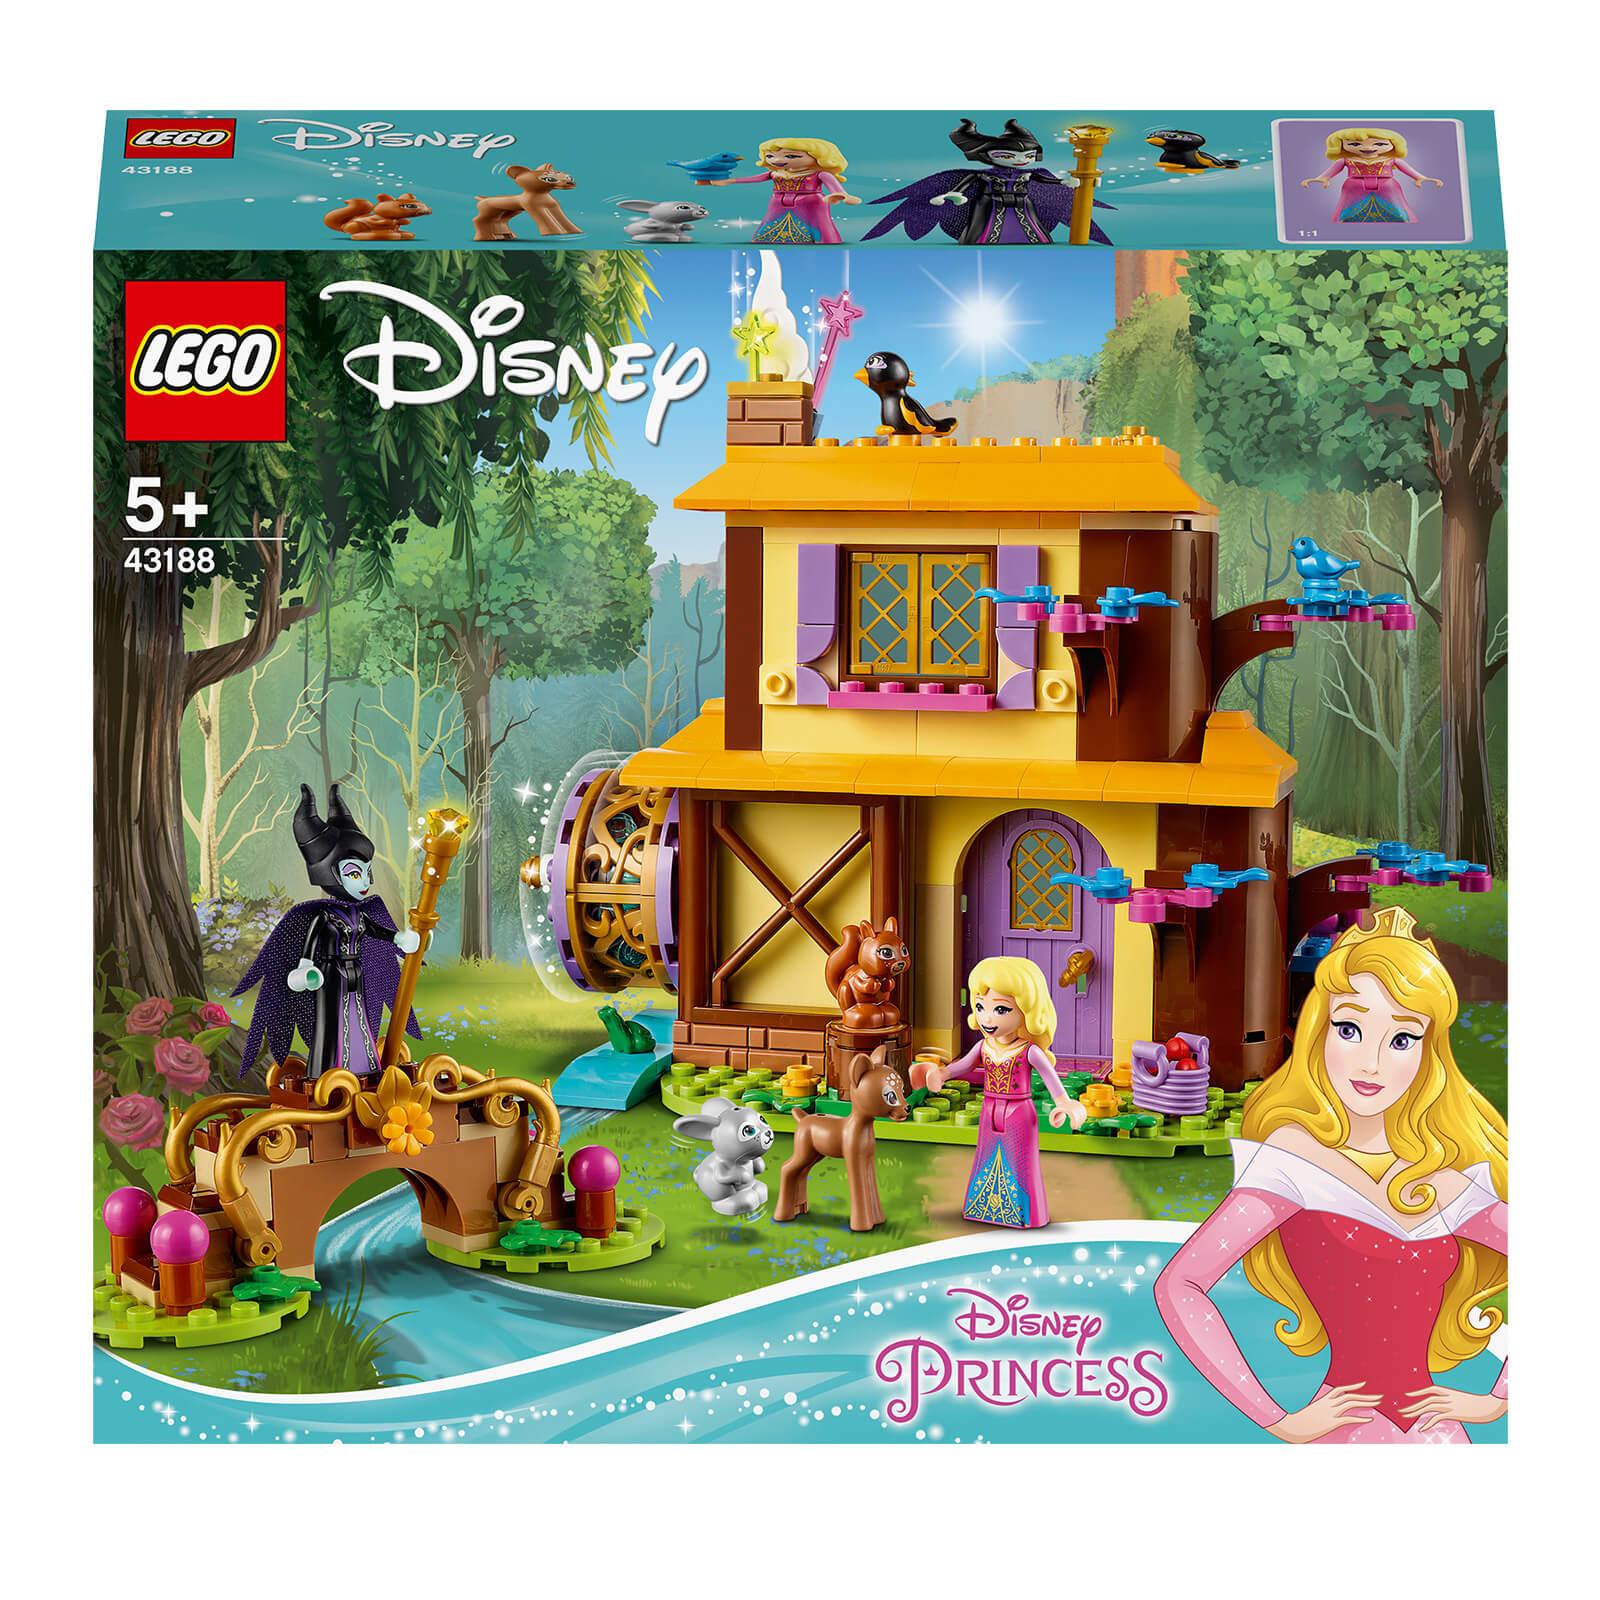 Lego Disney Princess: Aurora's Forest Cottage Playset (43188)